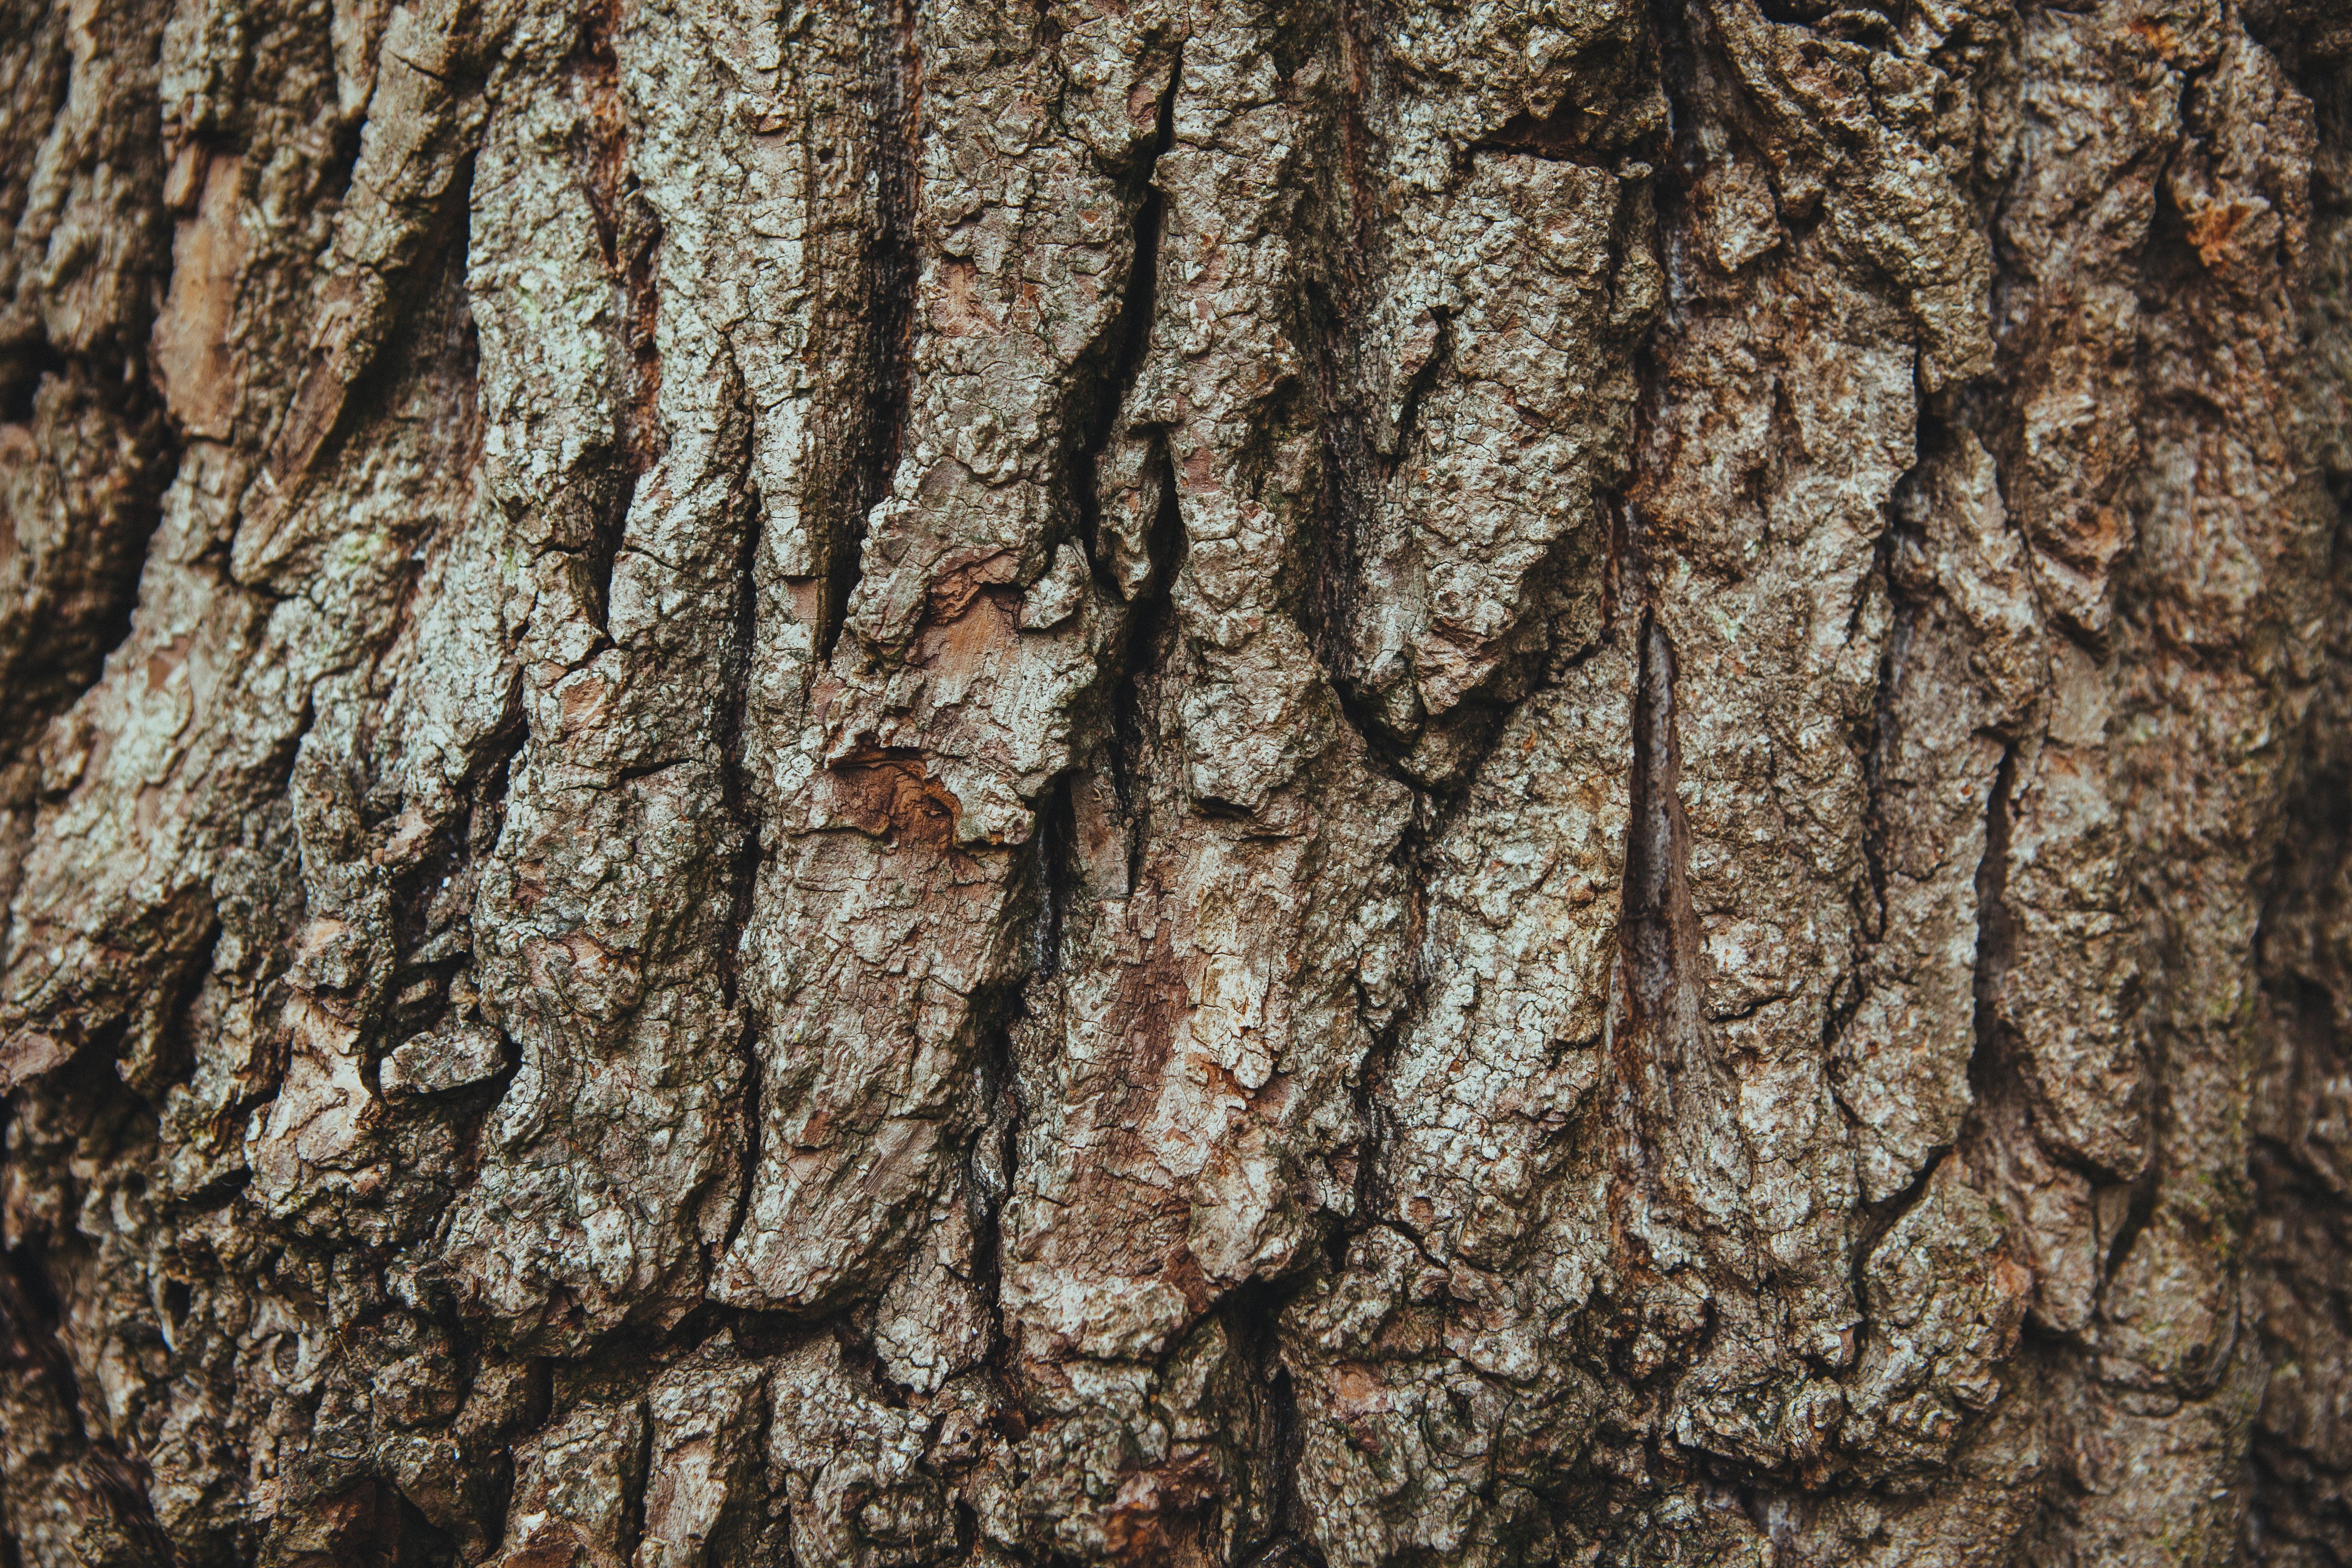 bark-english-oak-french-oak-1761